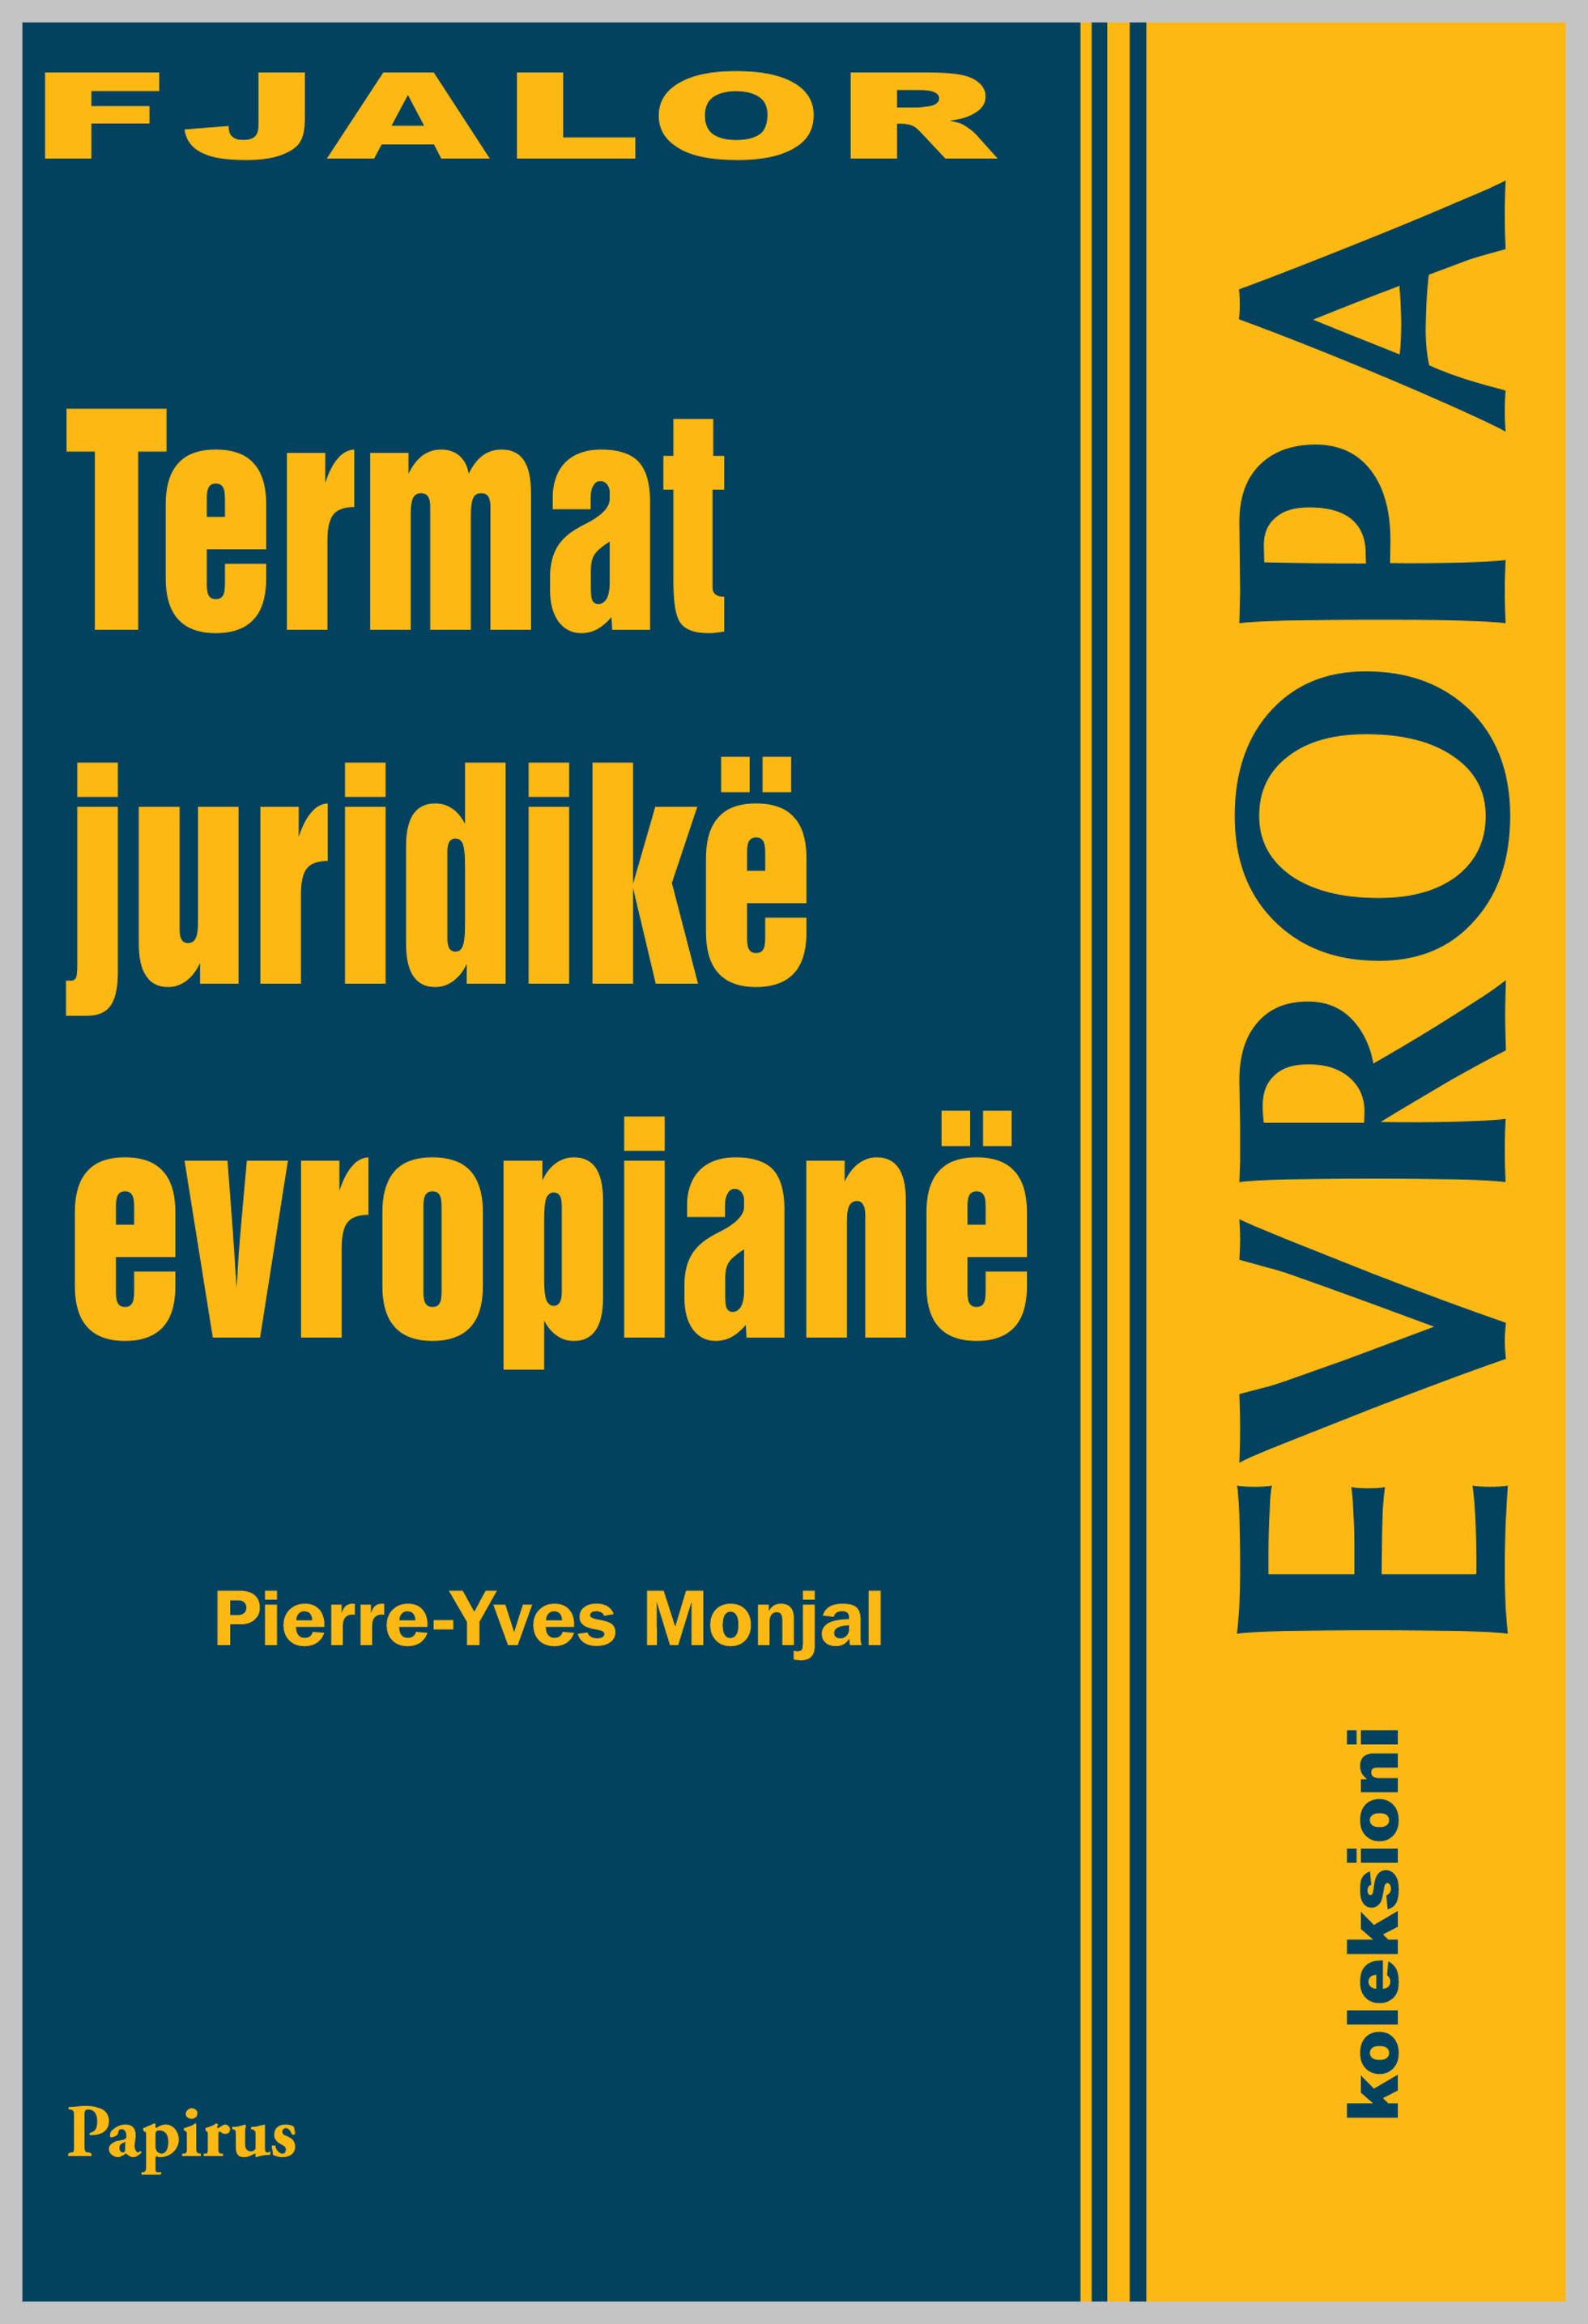 Fjalor Termat juridik europiane